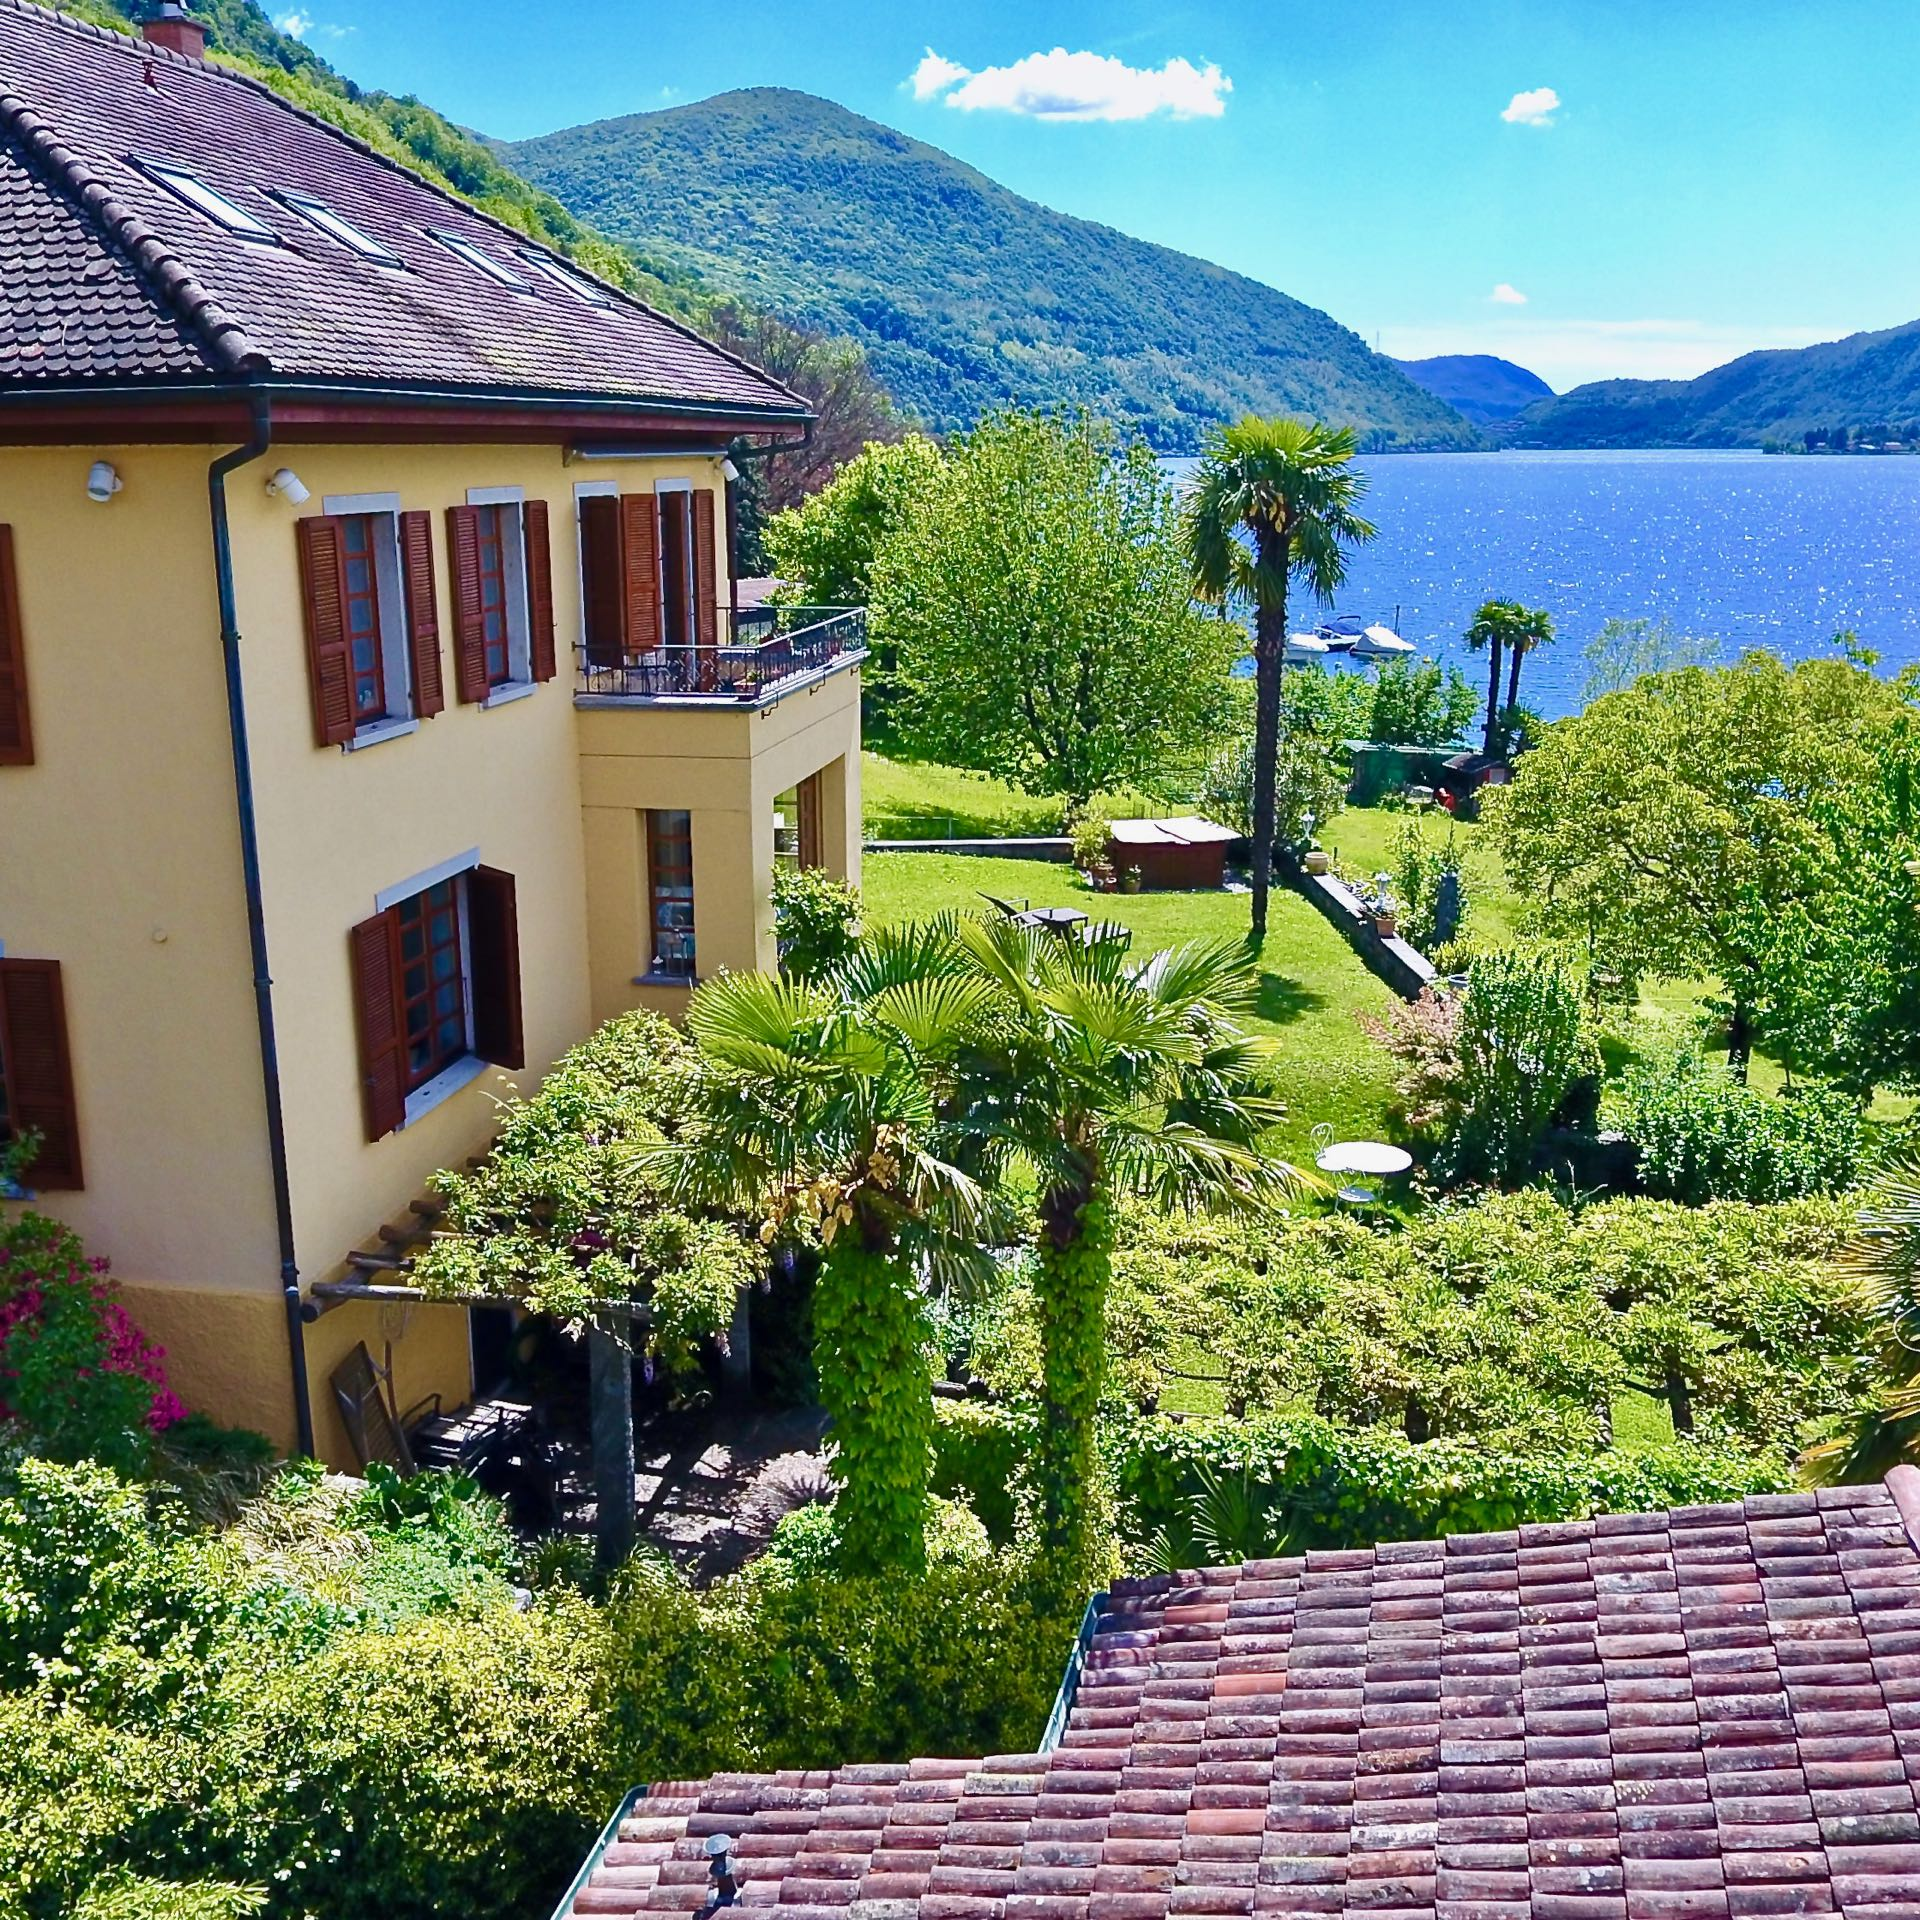 Beautiful villa in Carabietta, Ticino, for sale –directly by the Lake Lugano at the bottom of Collina d'Oro